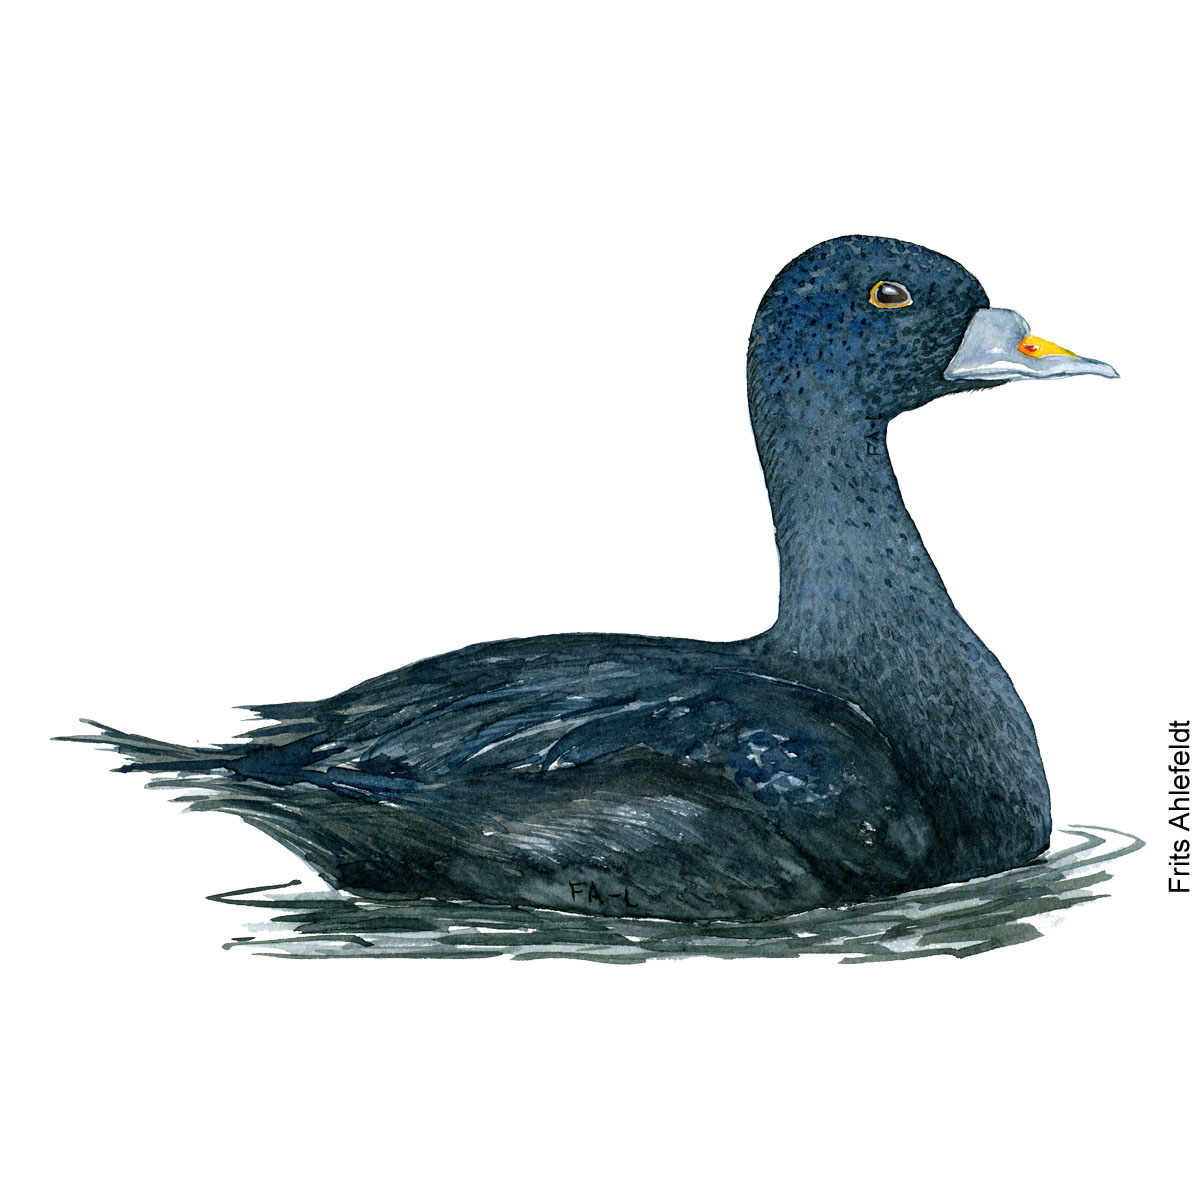 Sortand - Common scoter duck bird watercolor painting. Artwork by Frits Ahlefeldt. Fugle akvarel